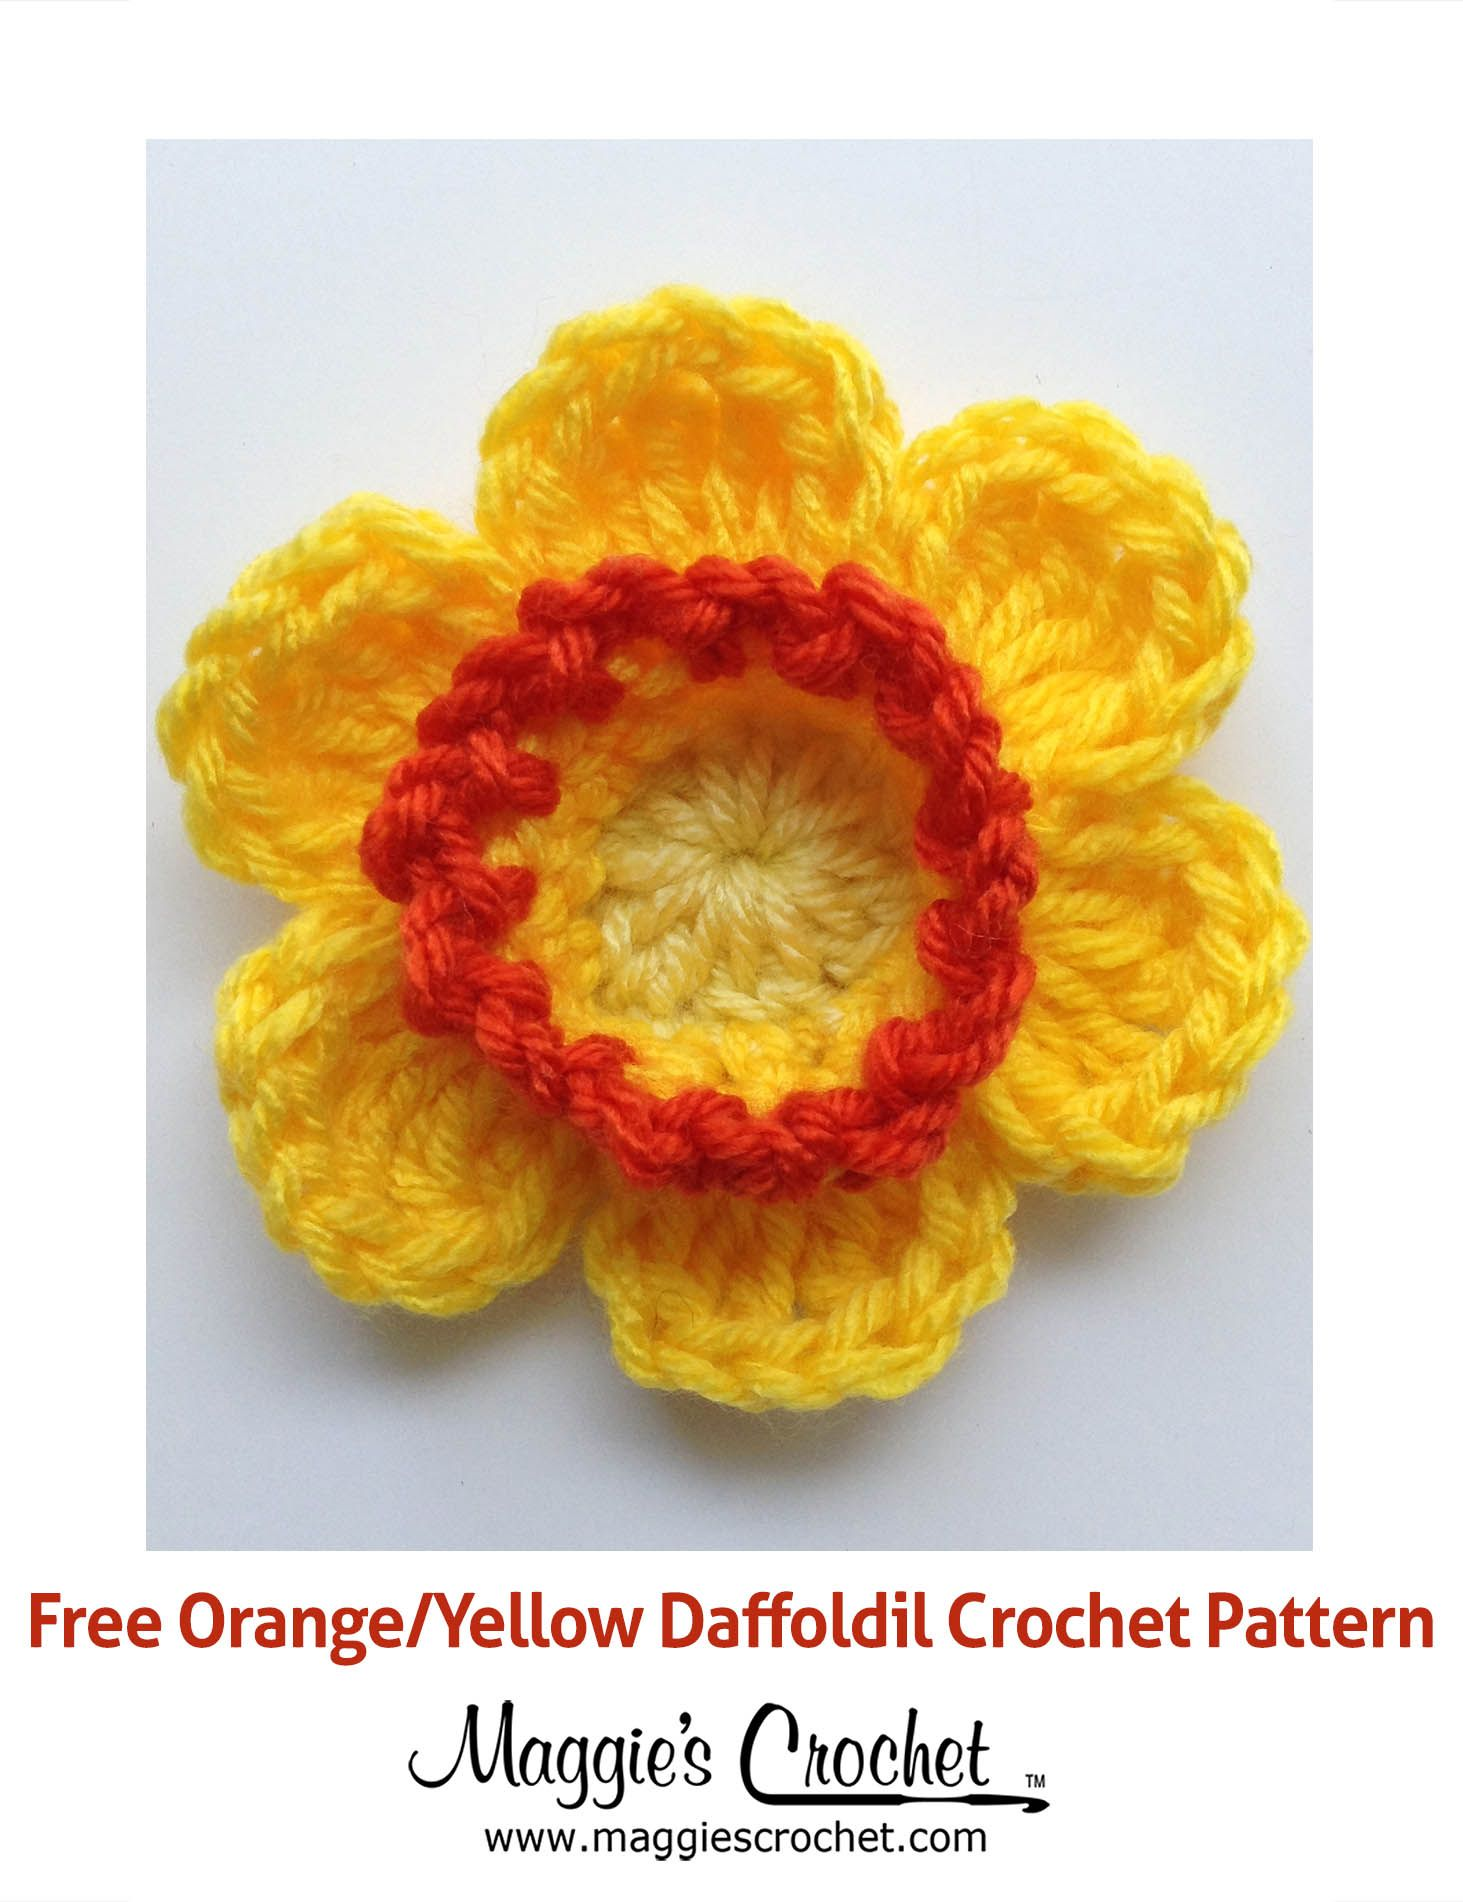 Orange & Yellow Daffodil - Free Crochet Pattern from Maggie's Crochet